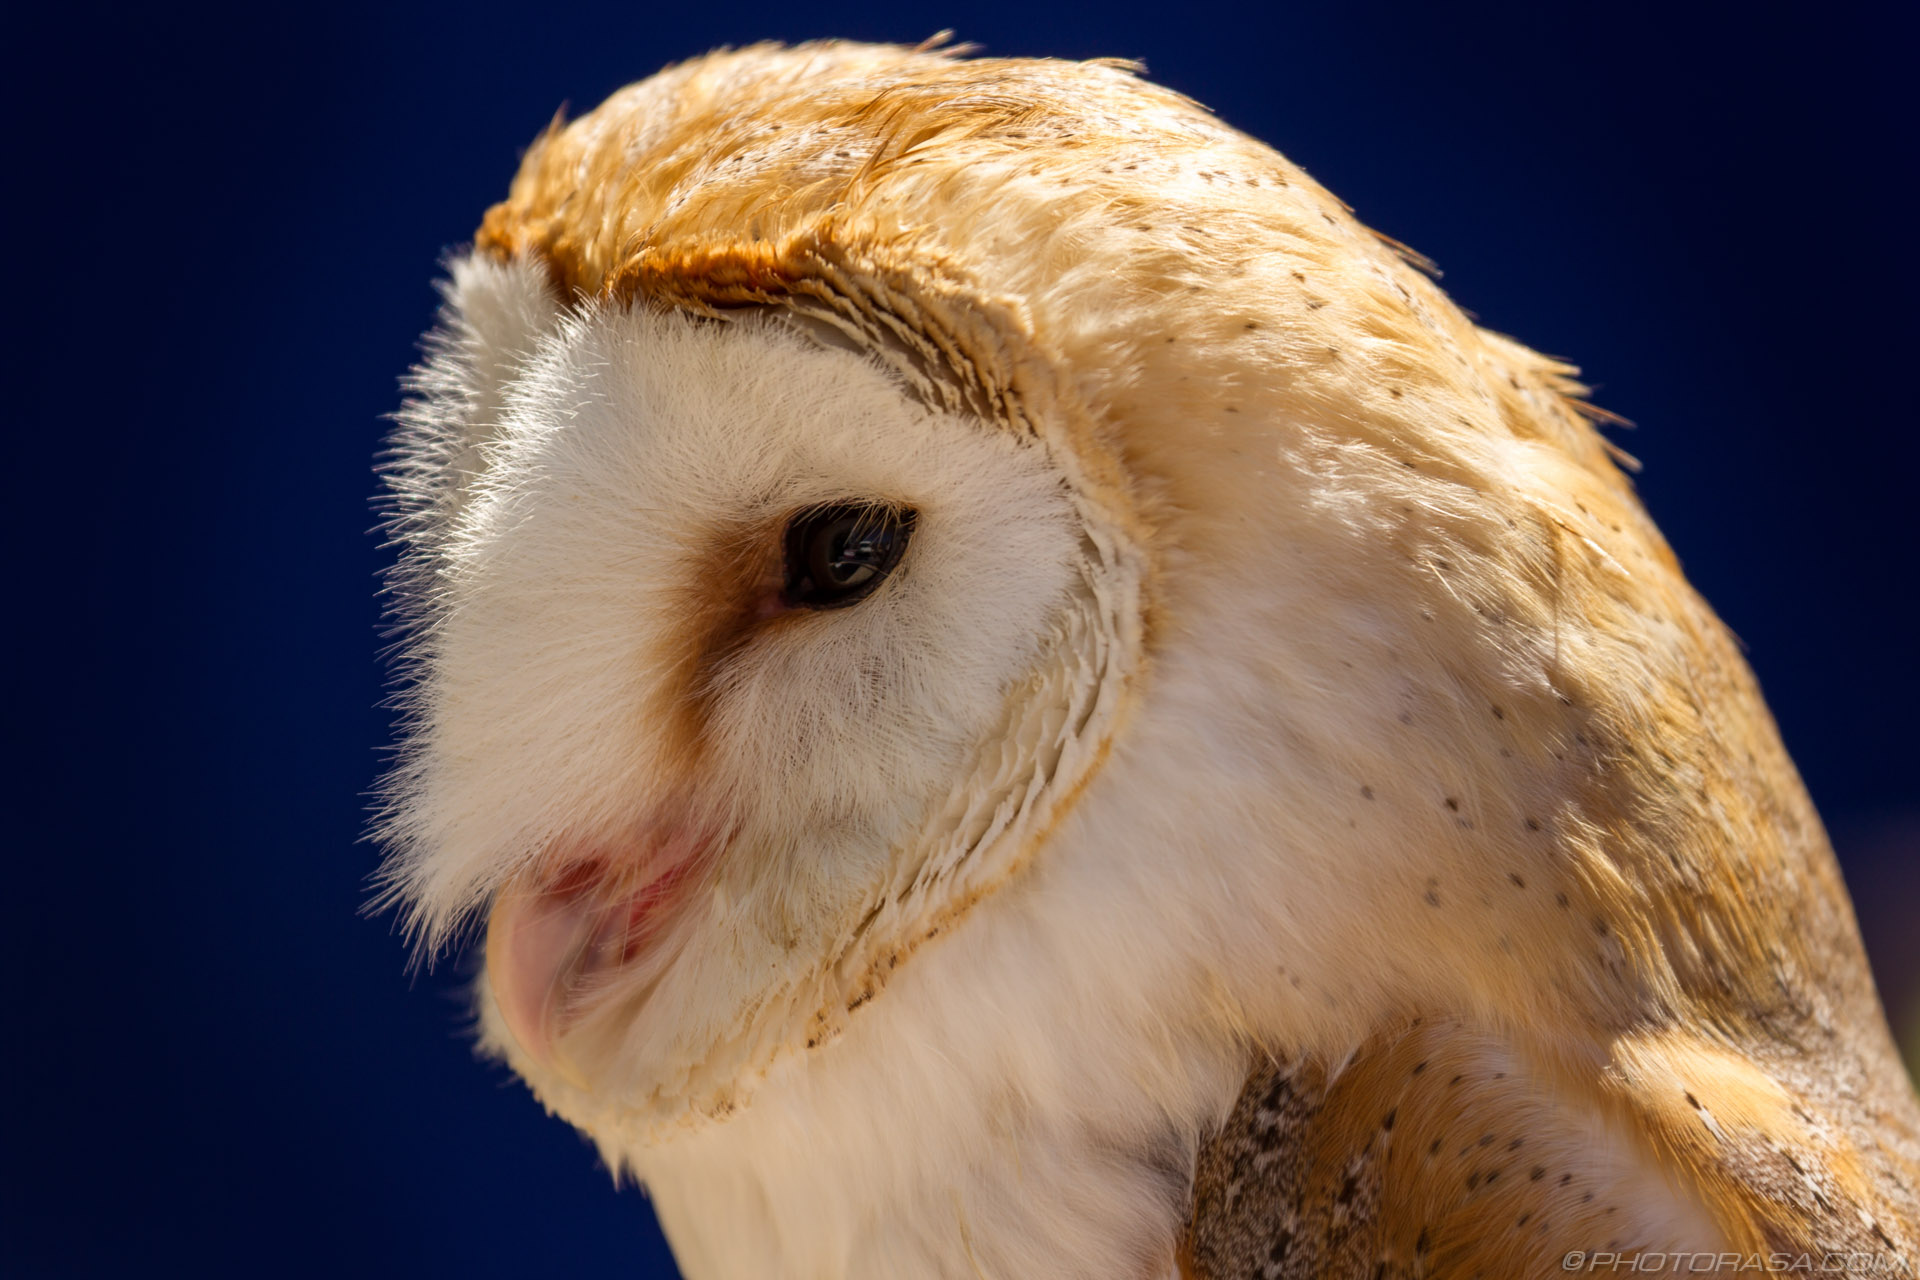 https://photorasa.com/owls/barn-owl-1/